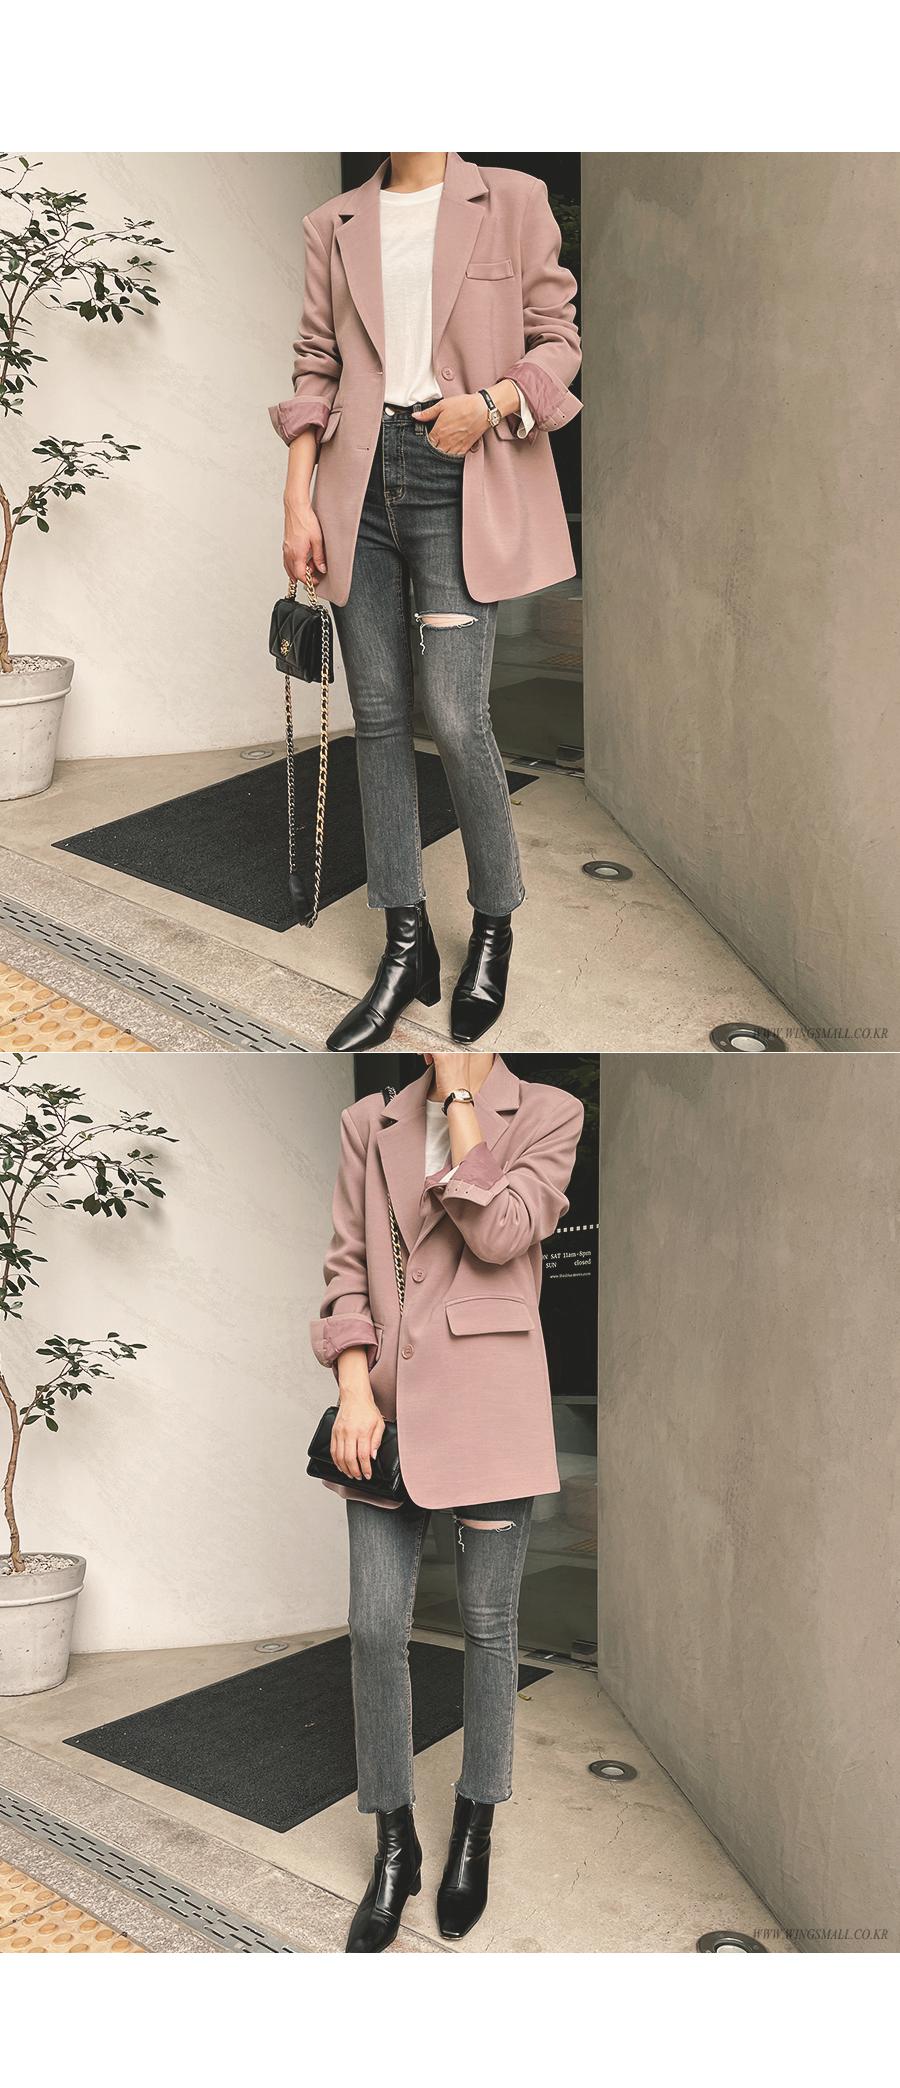 suspenders skirt/pants model image-S1L14